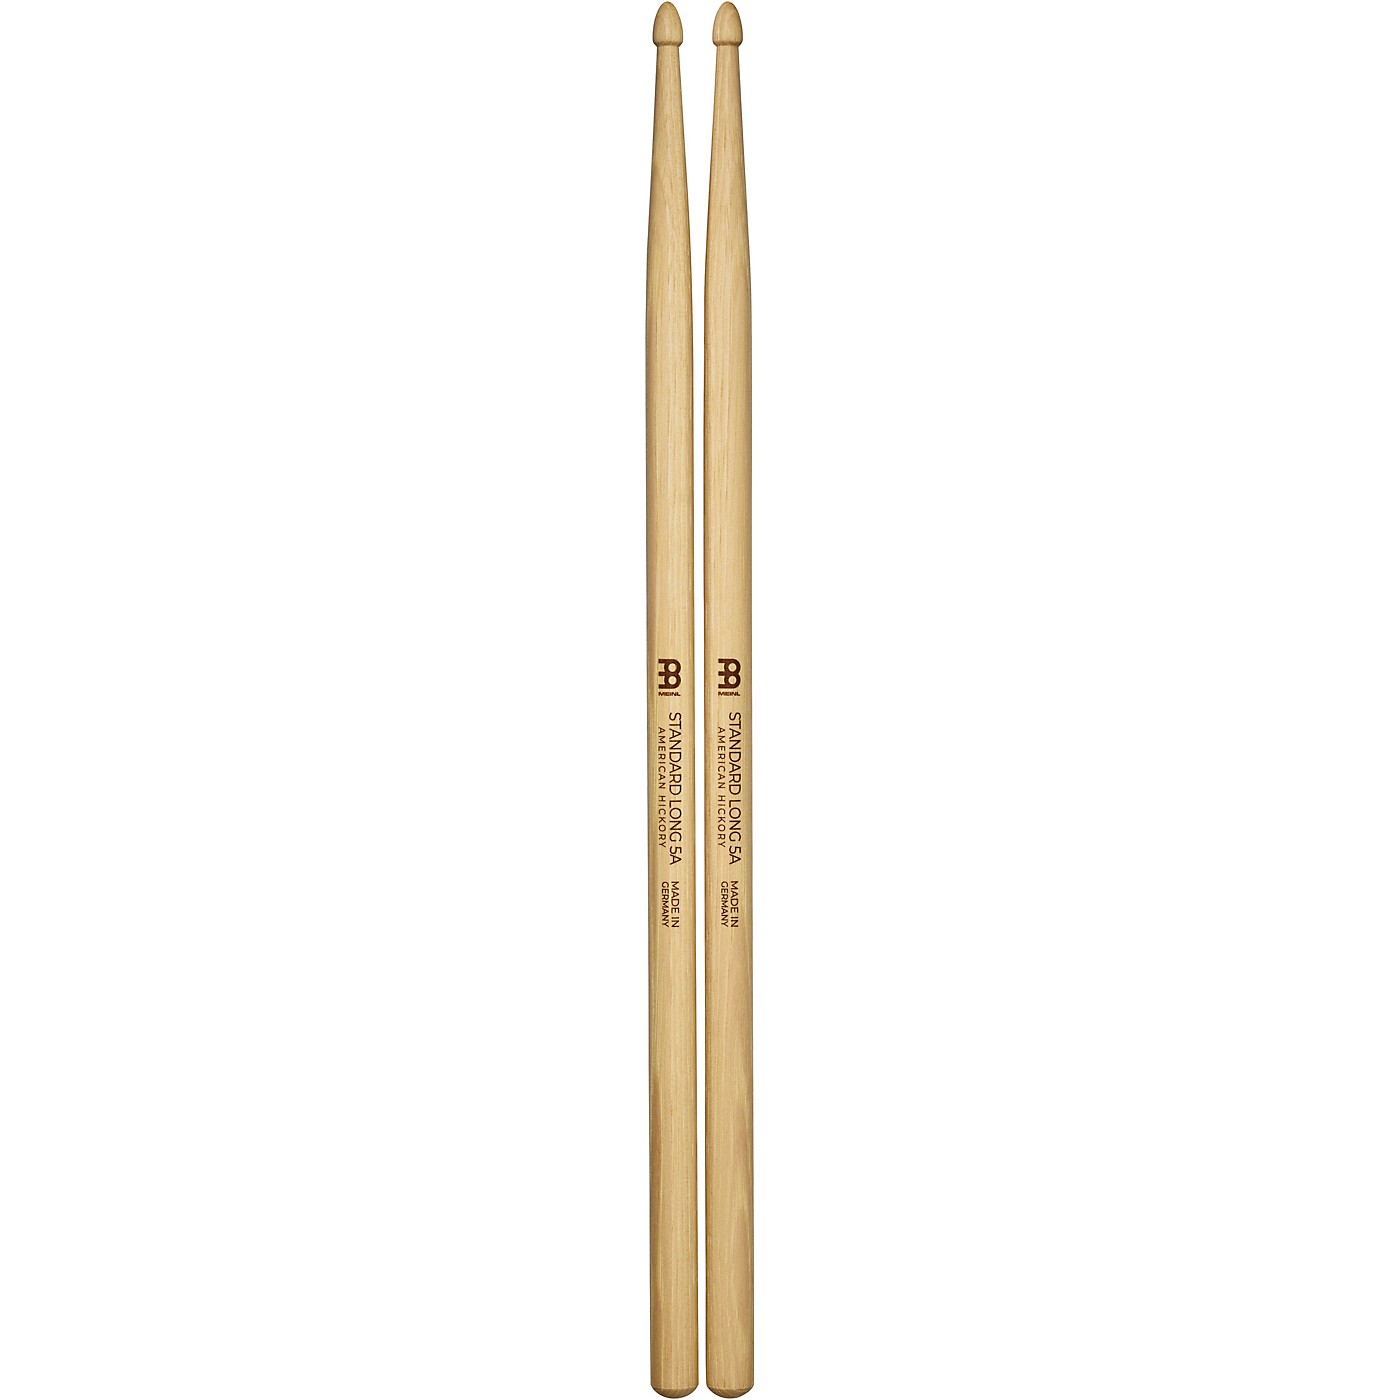 Meinl Stick & Brush Standard Long Hickory Drum Sticks thumbnail